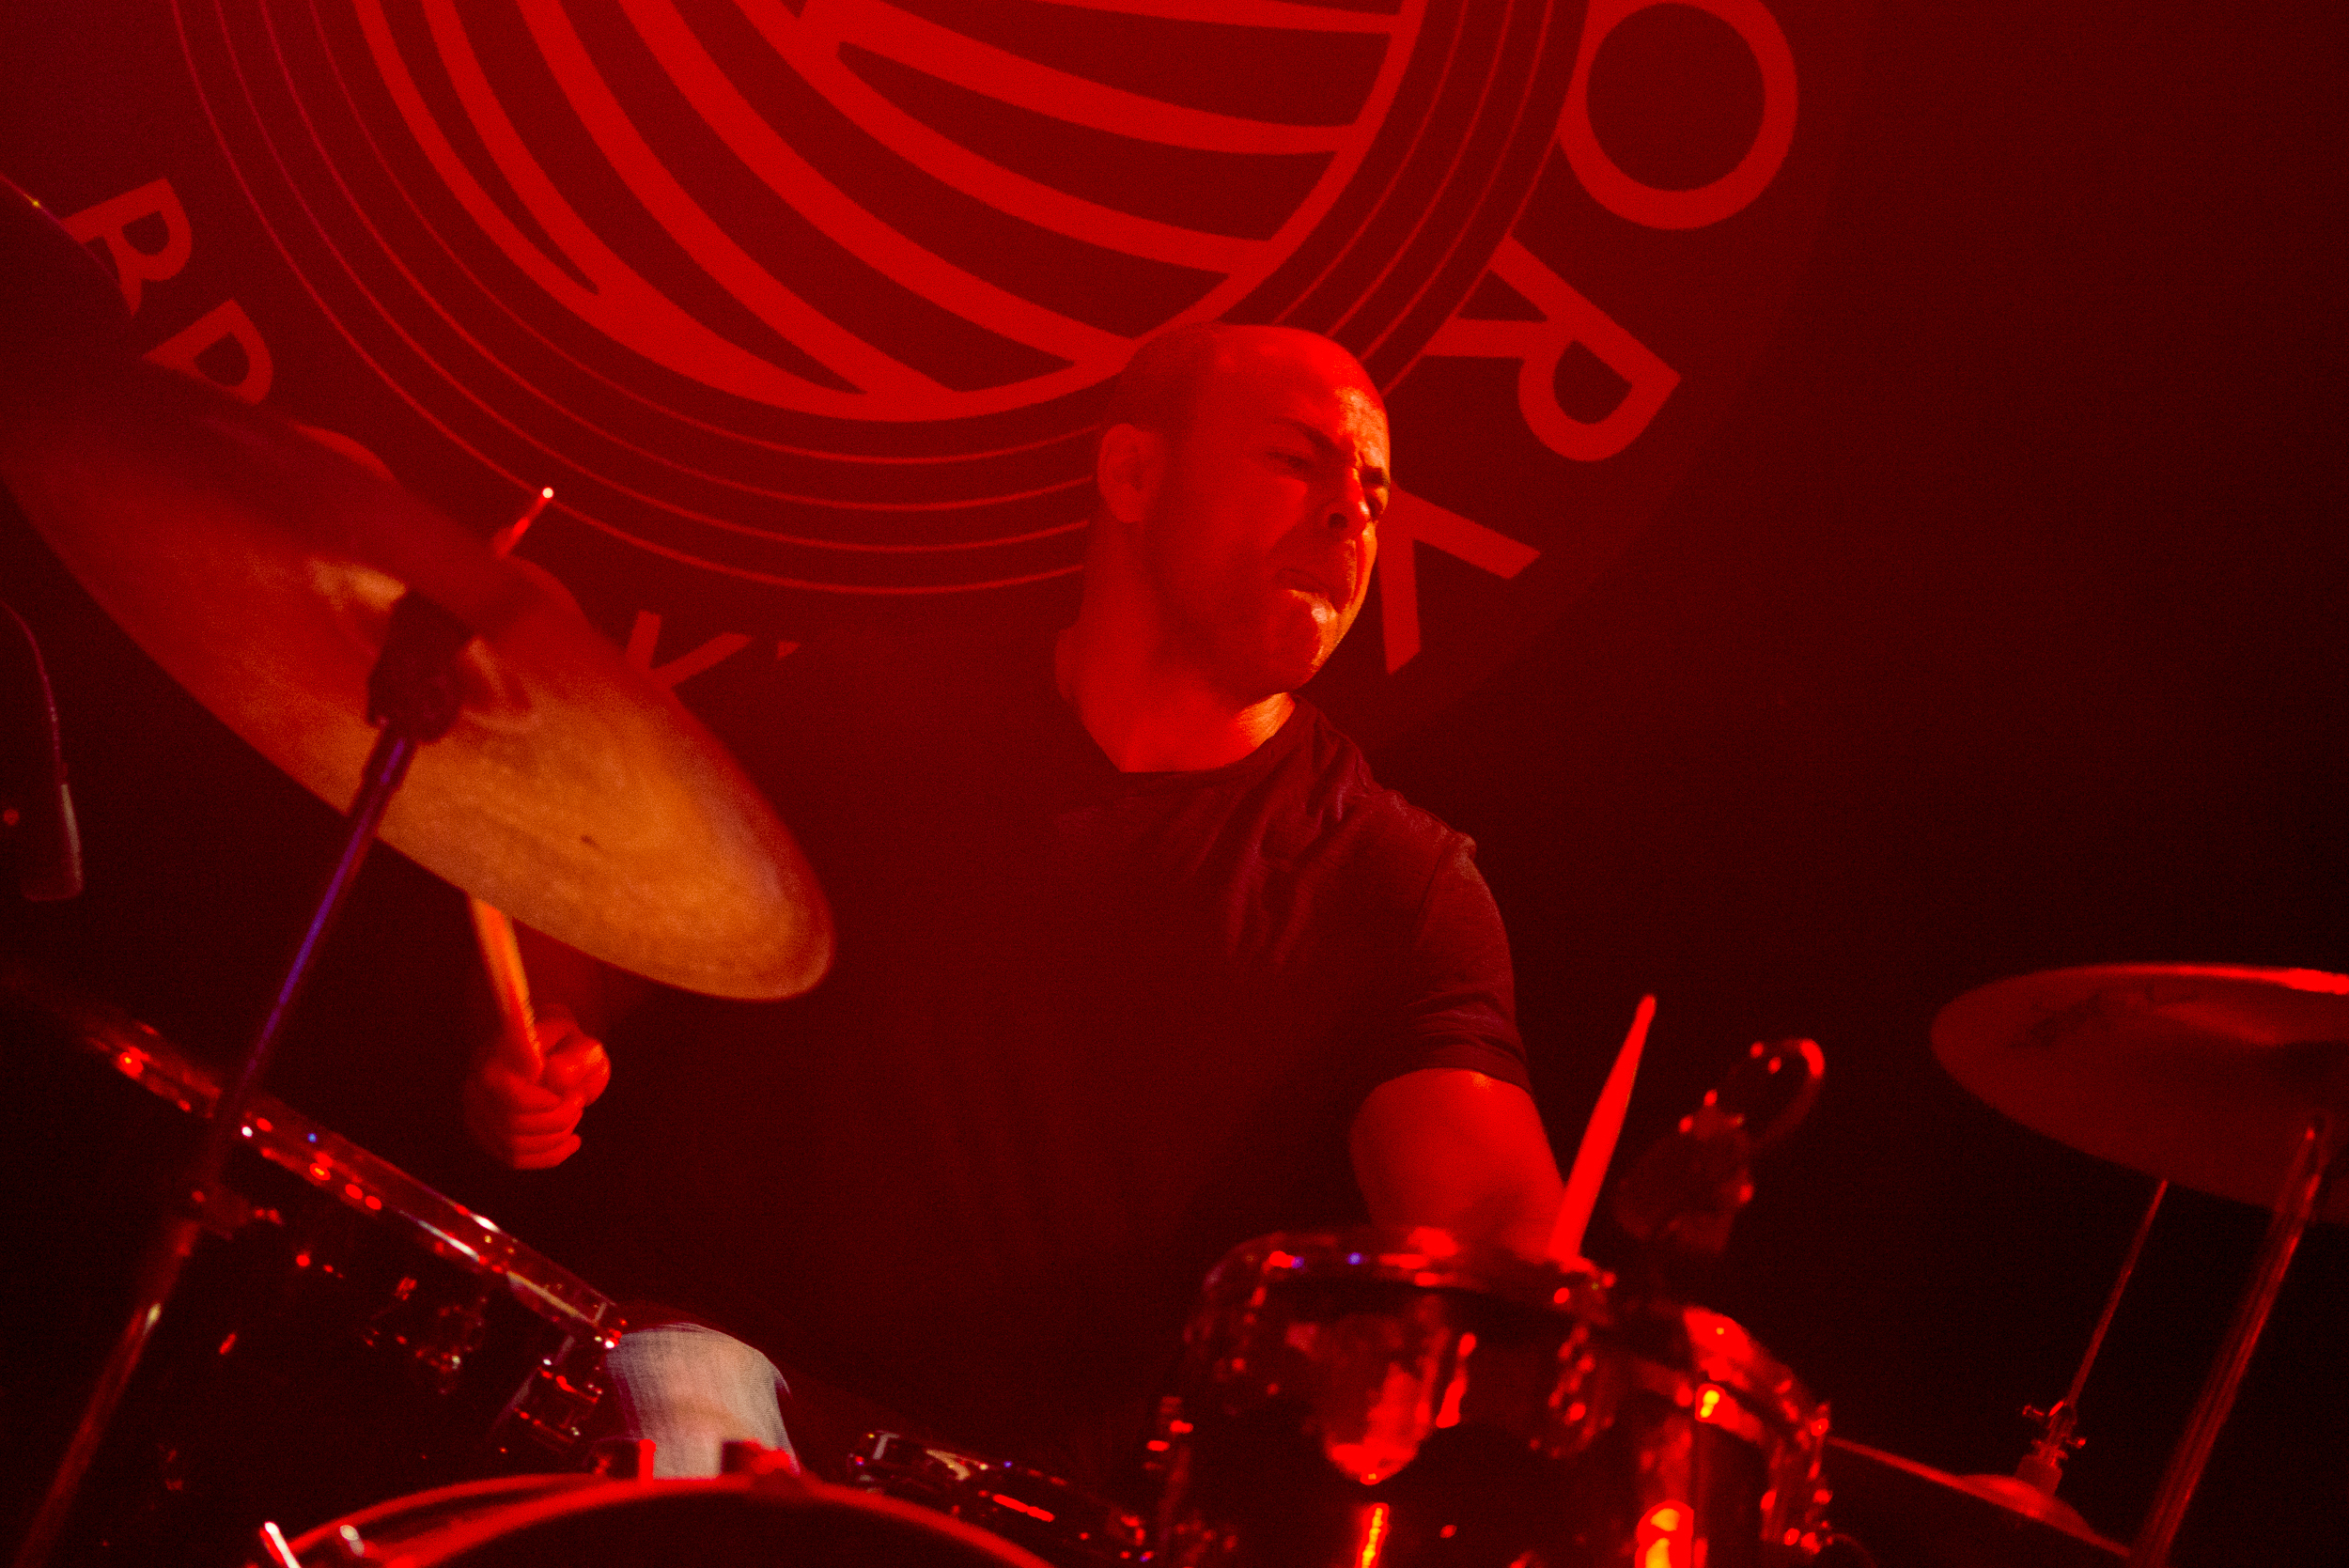 hail-eris-drummer-band-editorial-photography-brooklyn-ny-the-knitting-factory.jpg